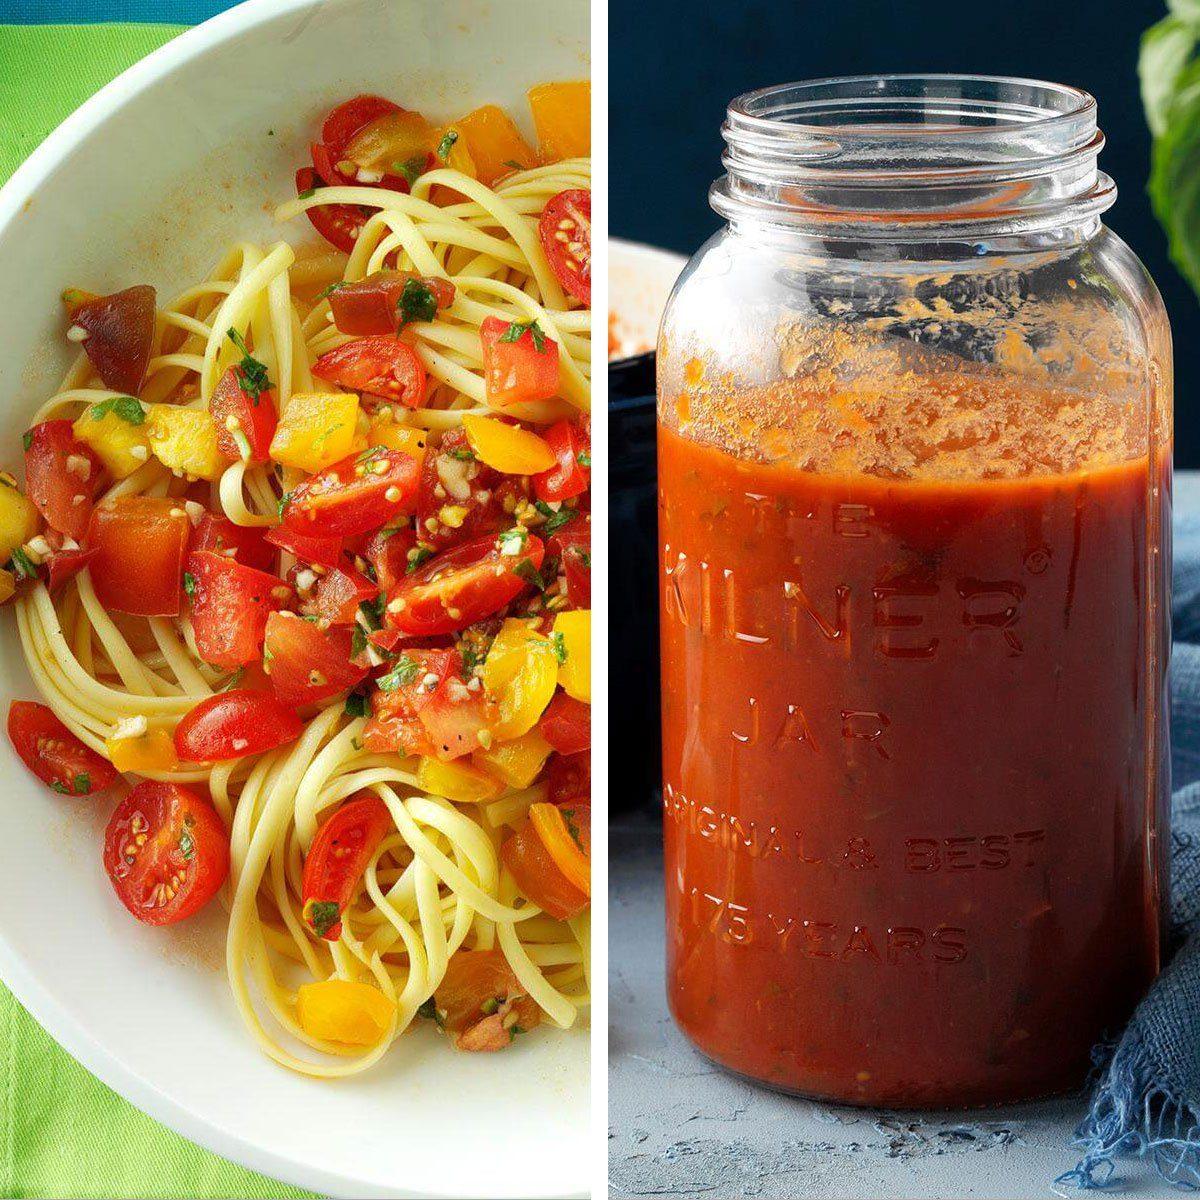 Pasta and jarred sauce